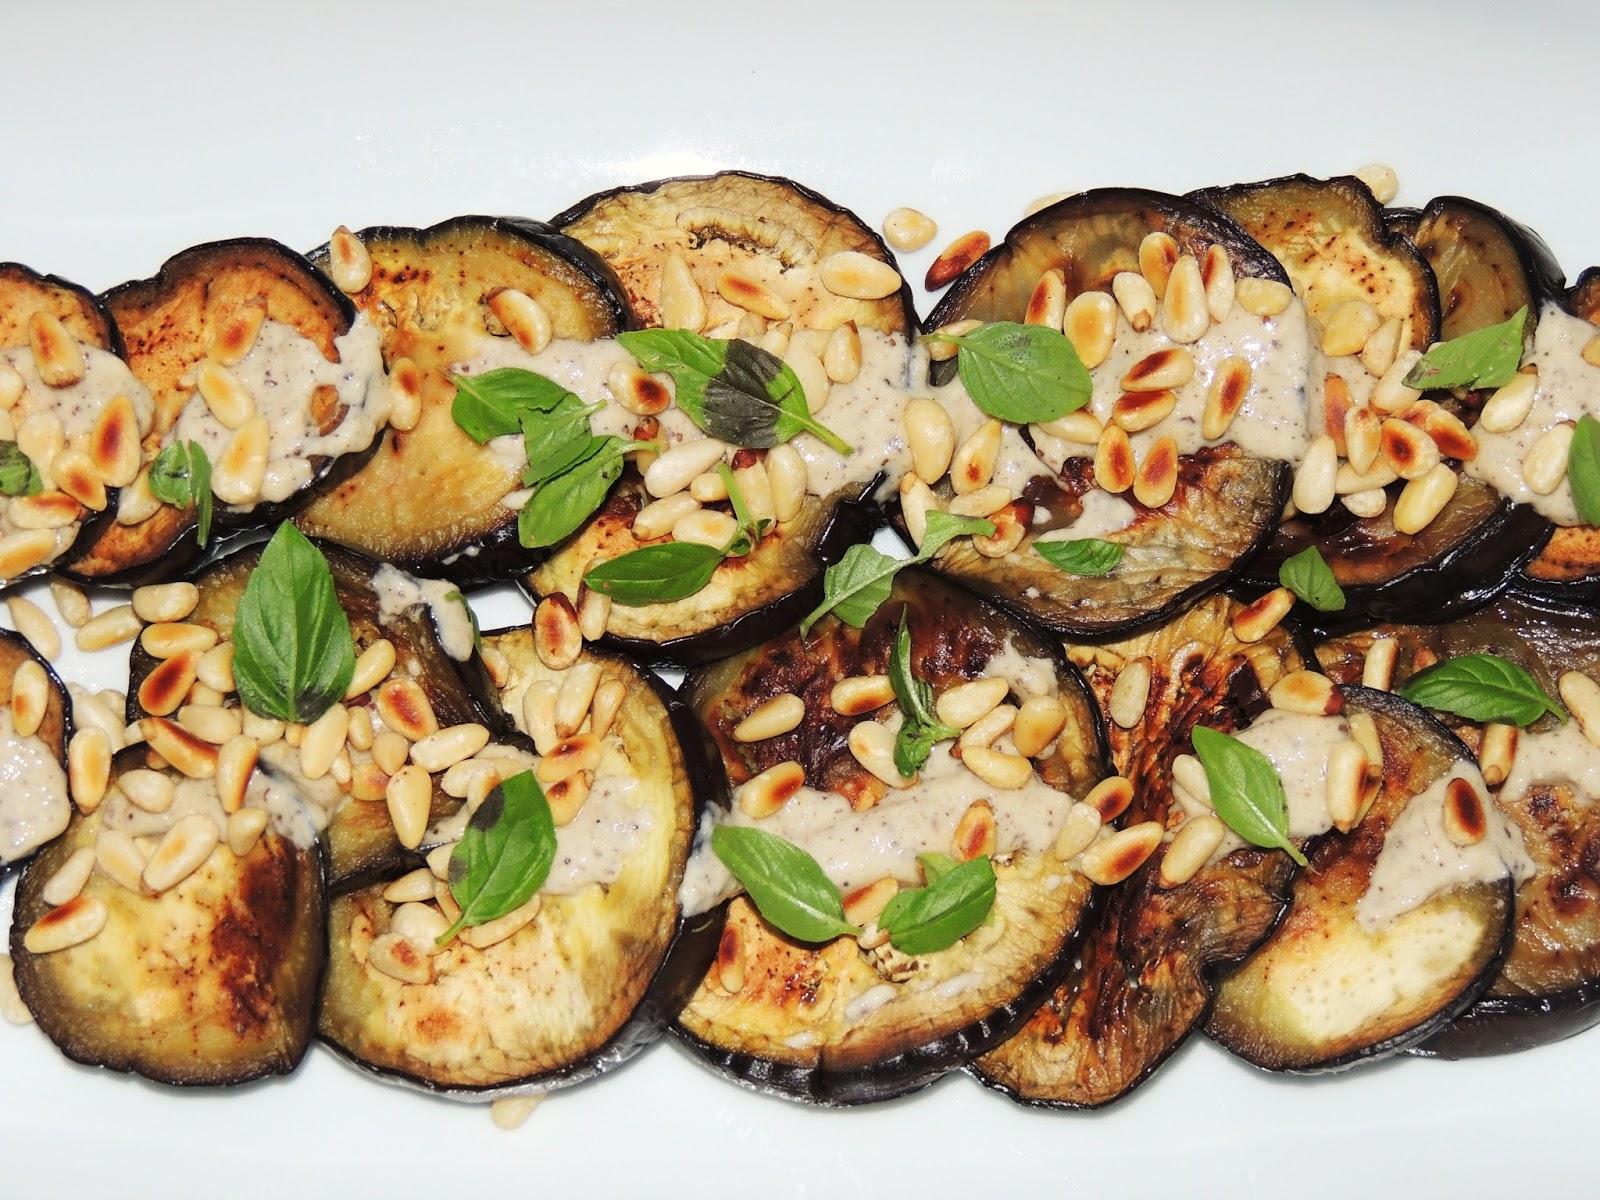 Midi cuisine aubergines grill es la plancha pignons et for Cuisine 0 la plancha